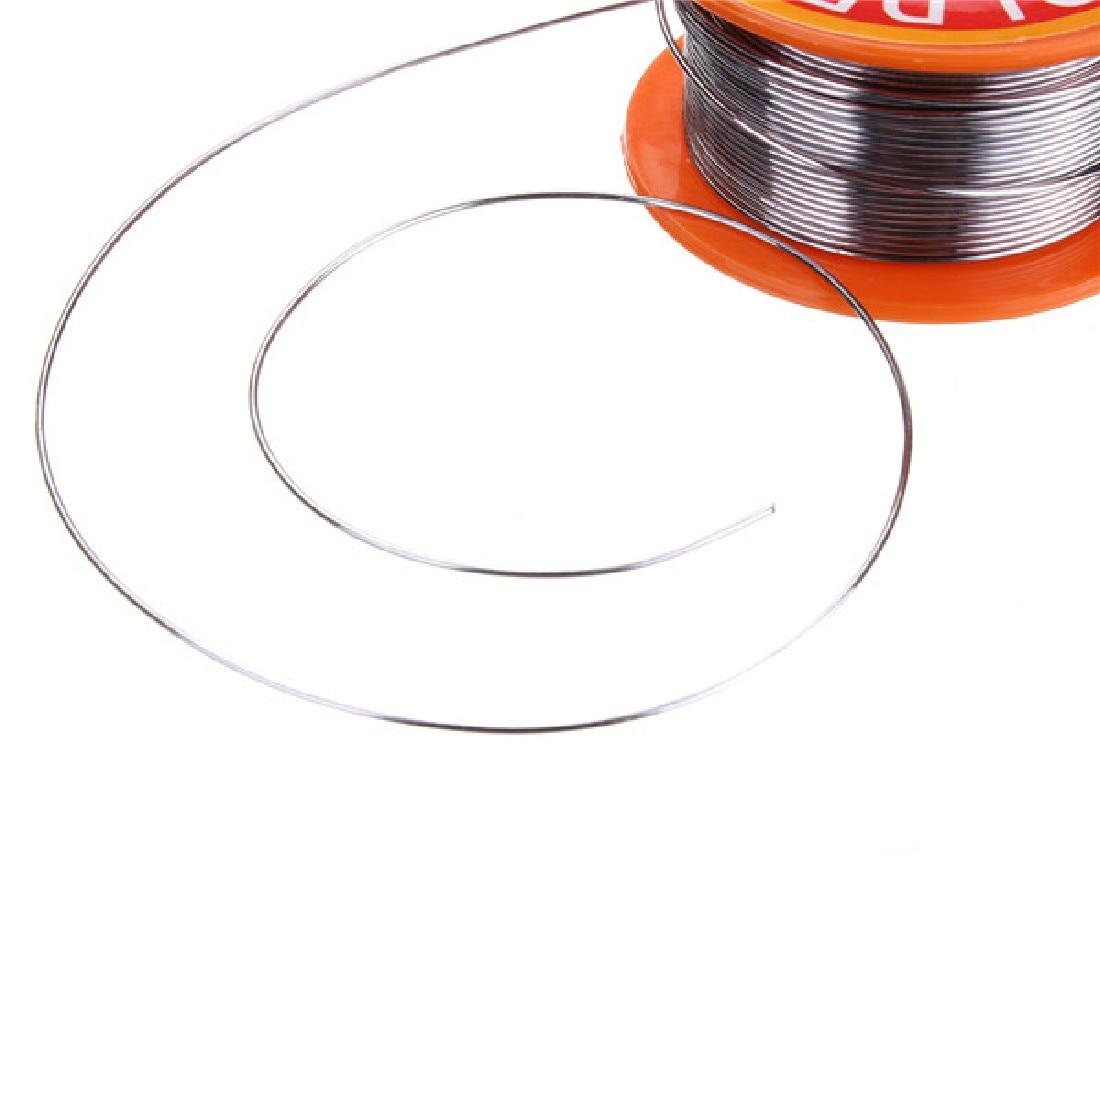 Купить с кэшбэком No-clean Tin 0.8mm Rosin Core Tin/Lead 0.8mm Alloy Rosin Roll Flux Solder Wire Reel Welding Line Solder Wire Clean Rosin Core